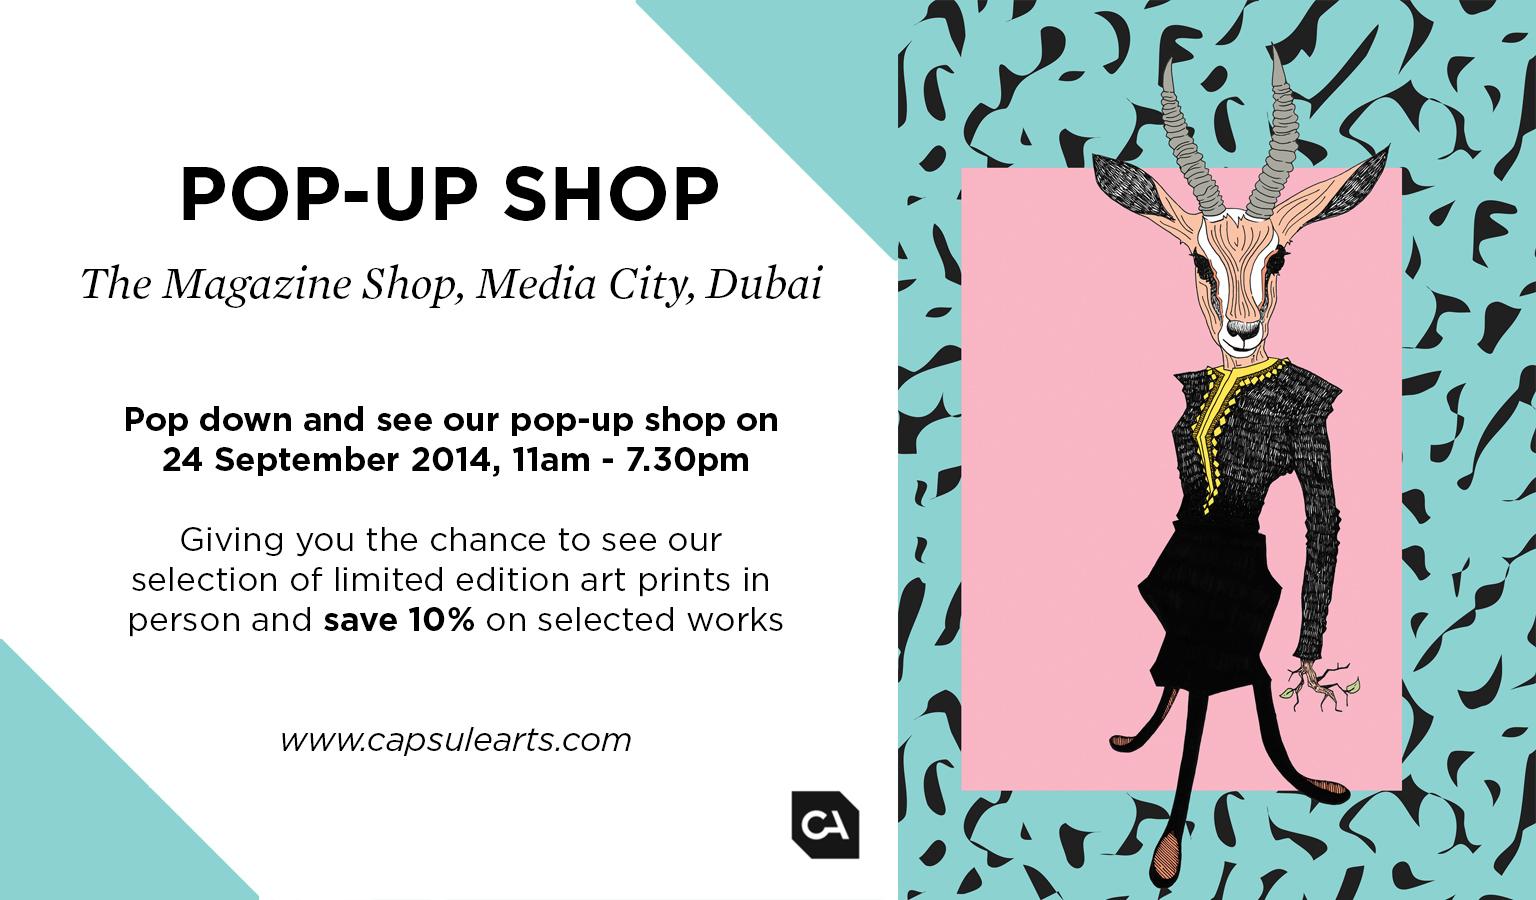 magazine_shop_invite.jpg